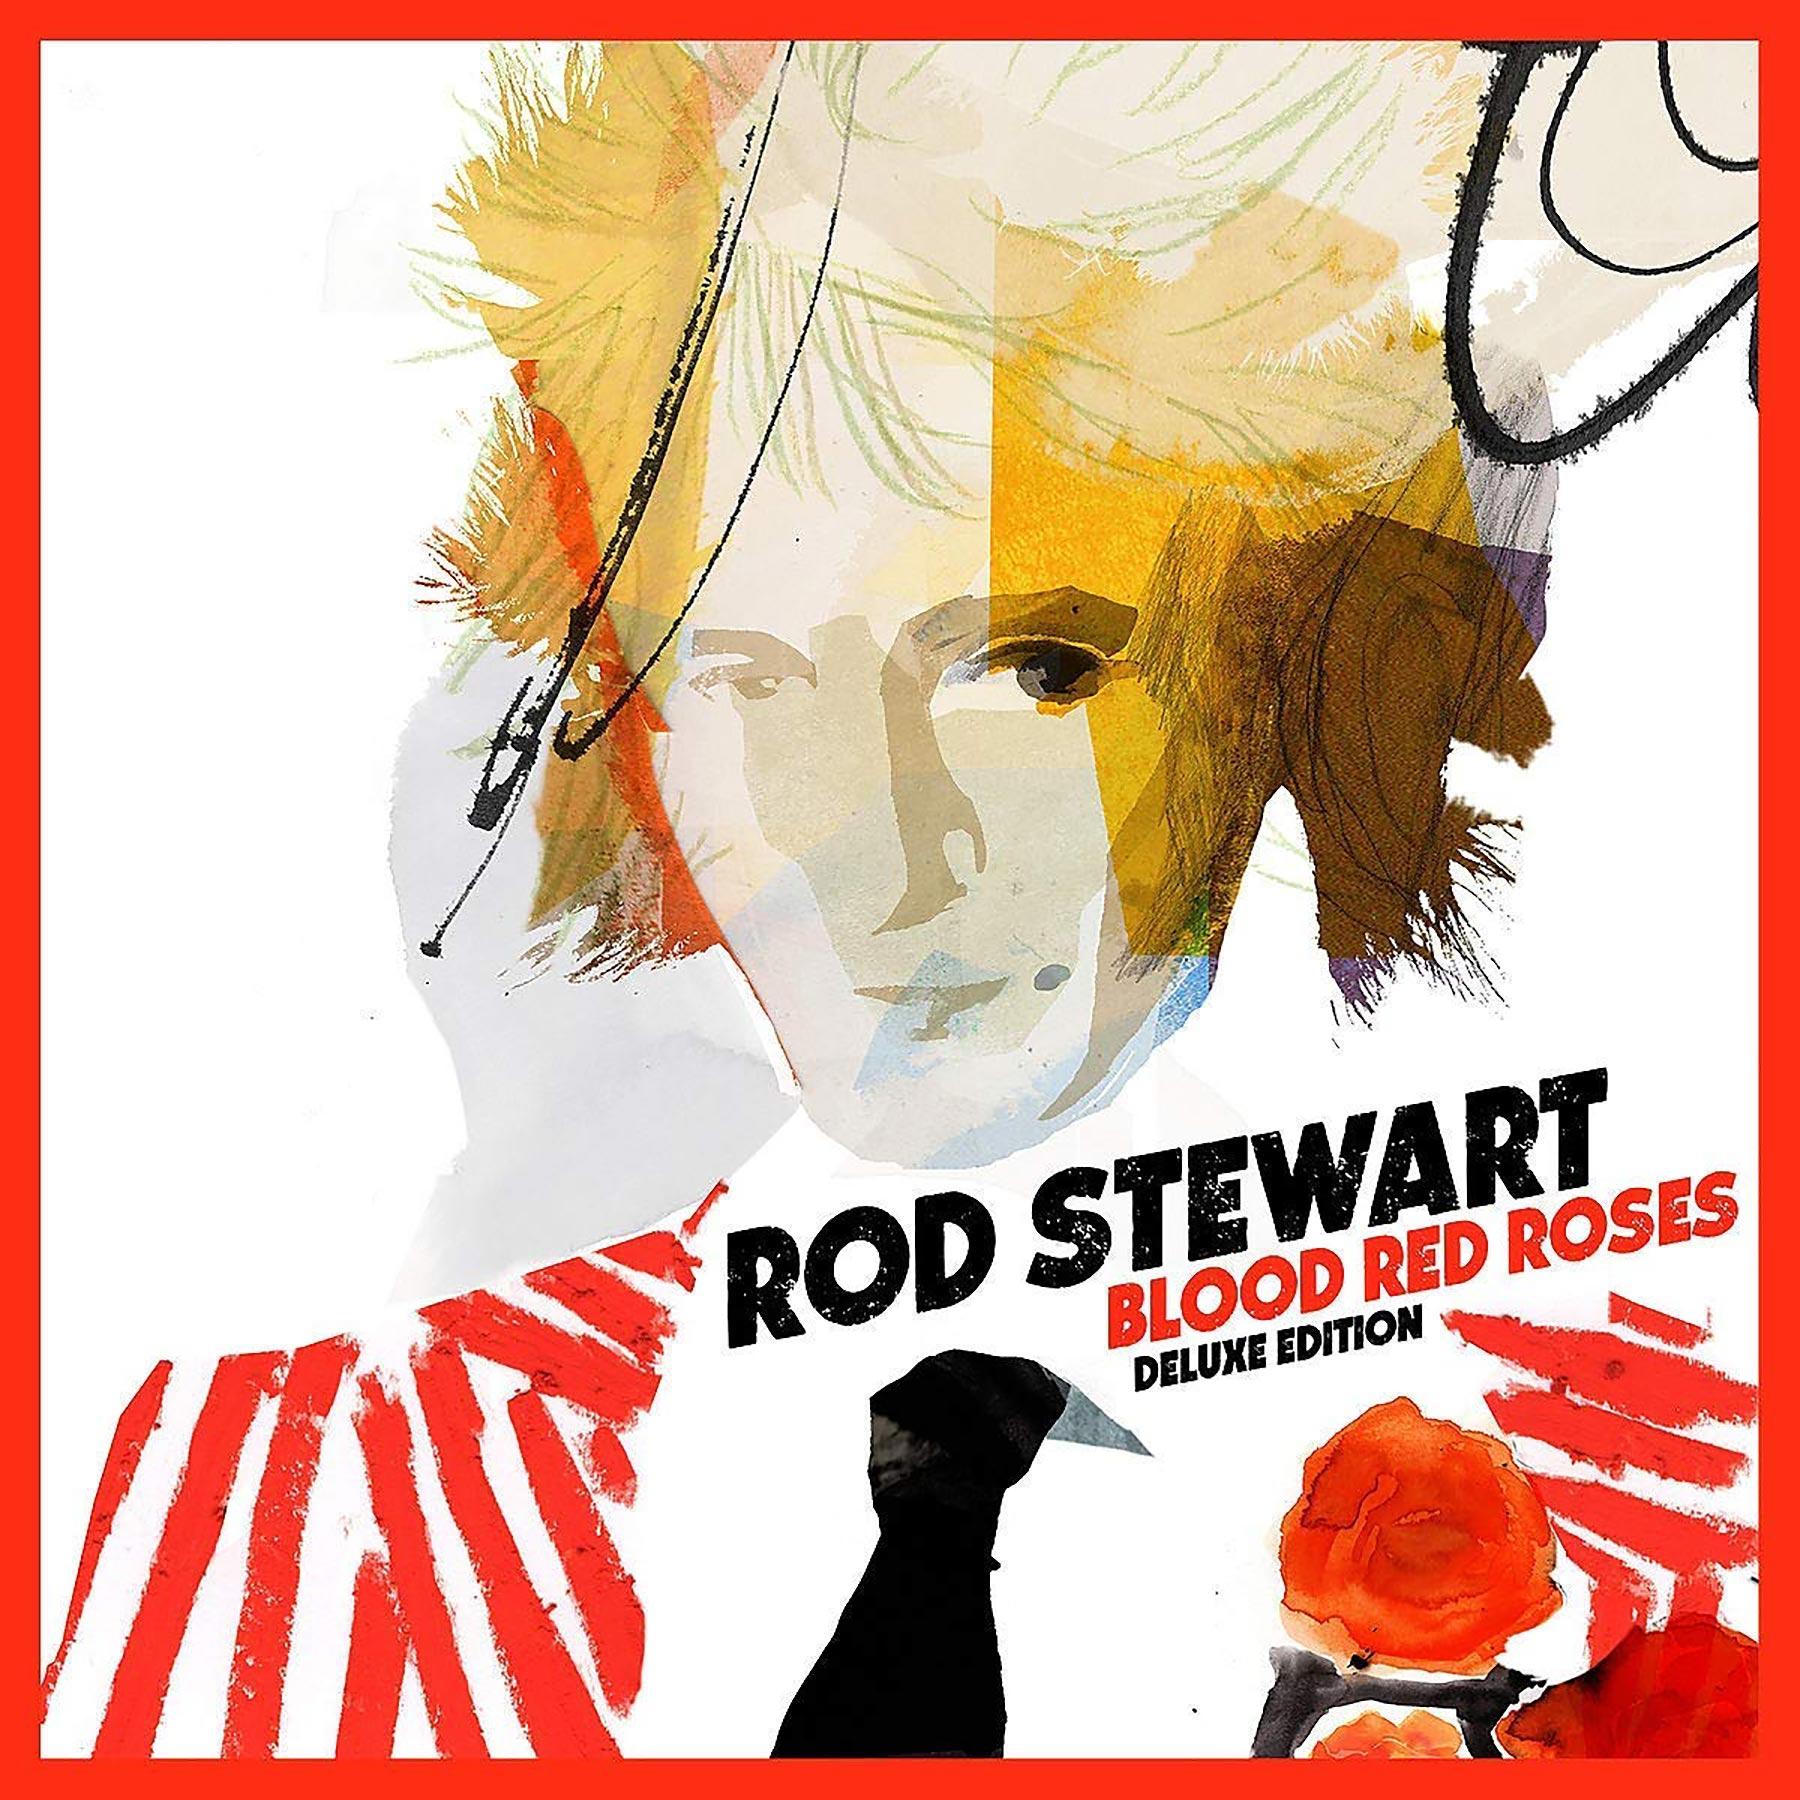 Rod Stewart, Blood Red RosesCR: Republic/Rod Stewart/Decca